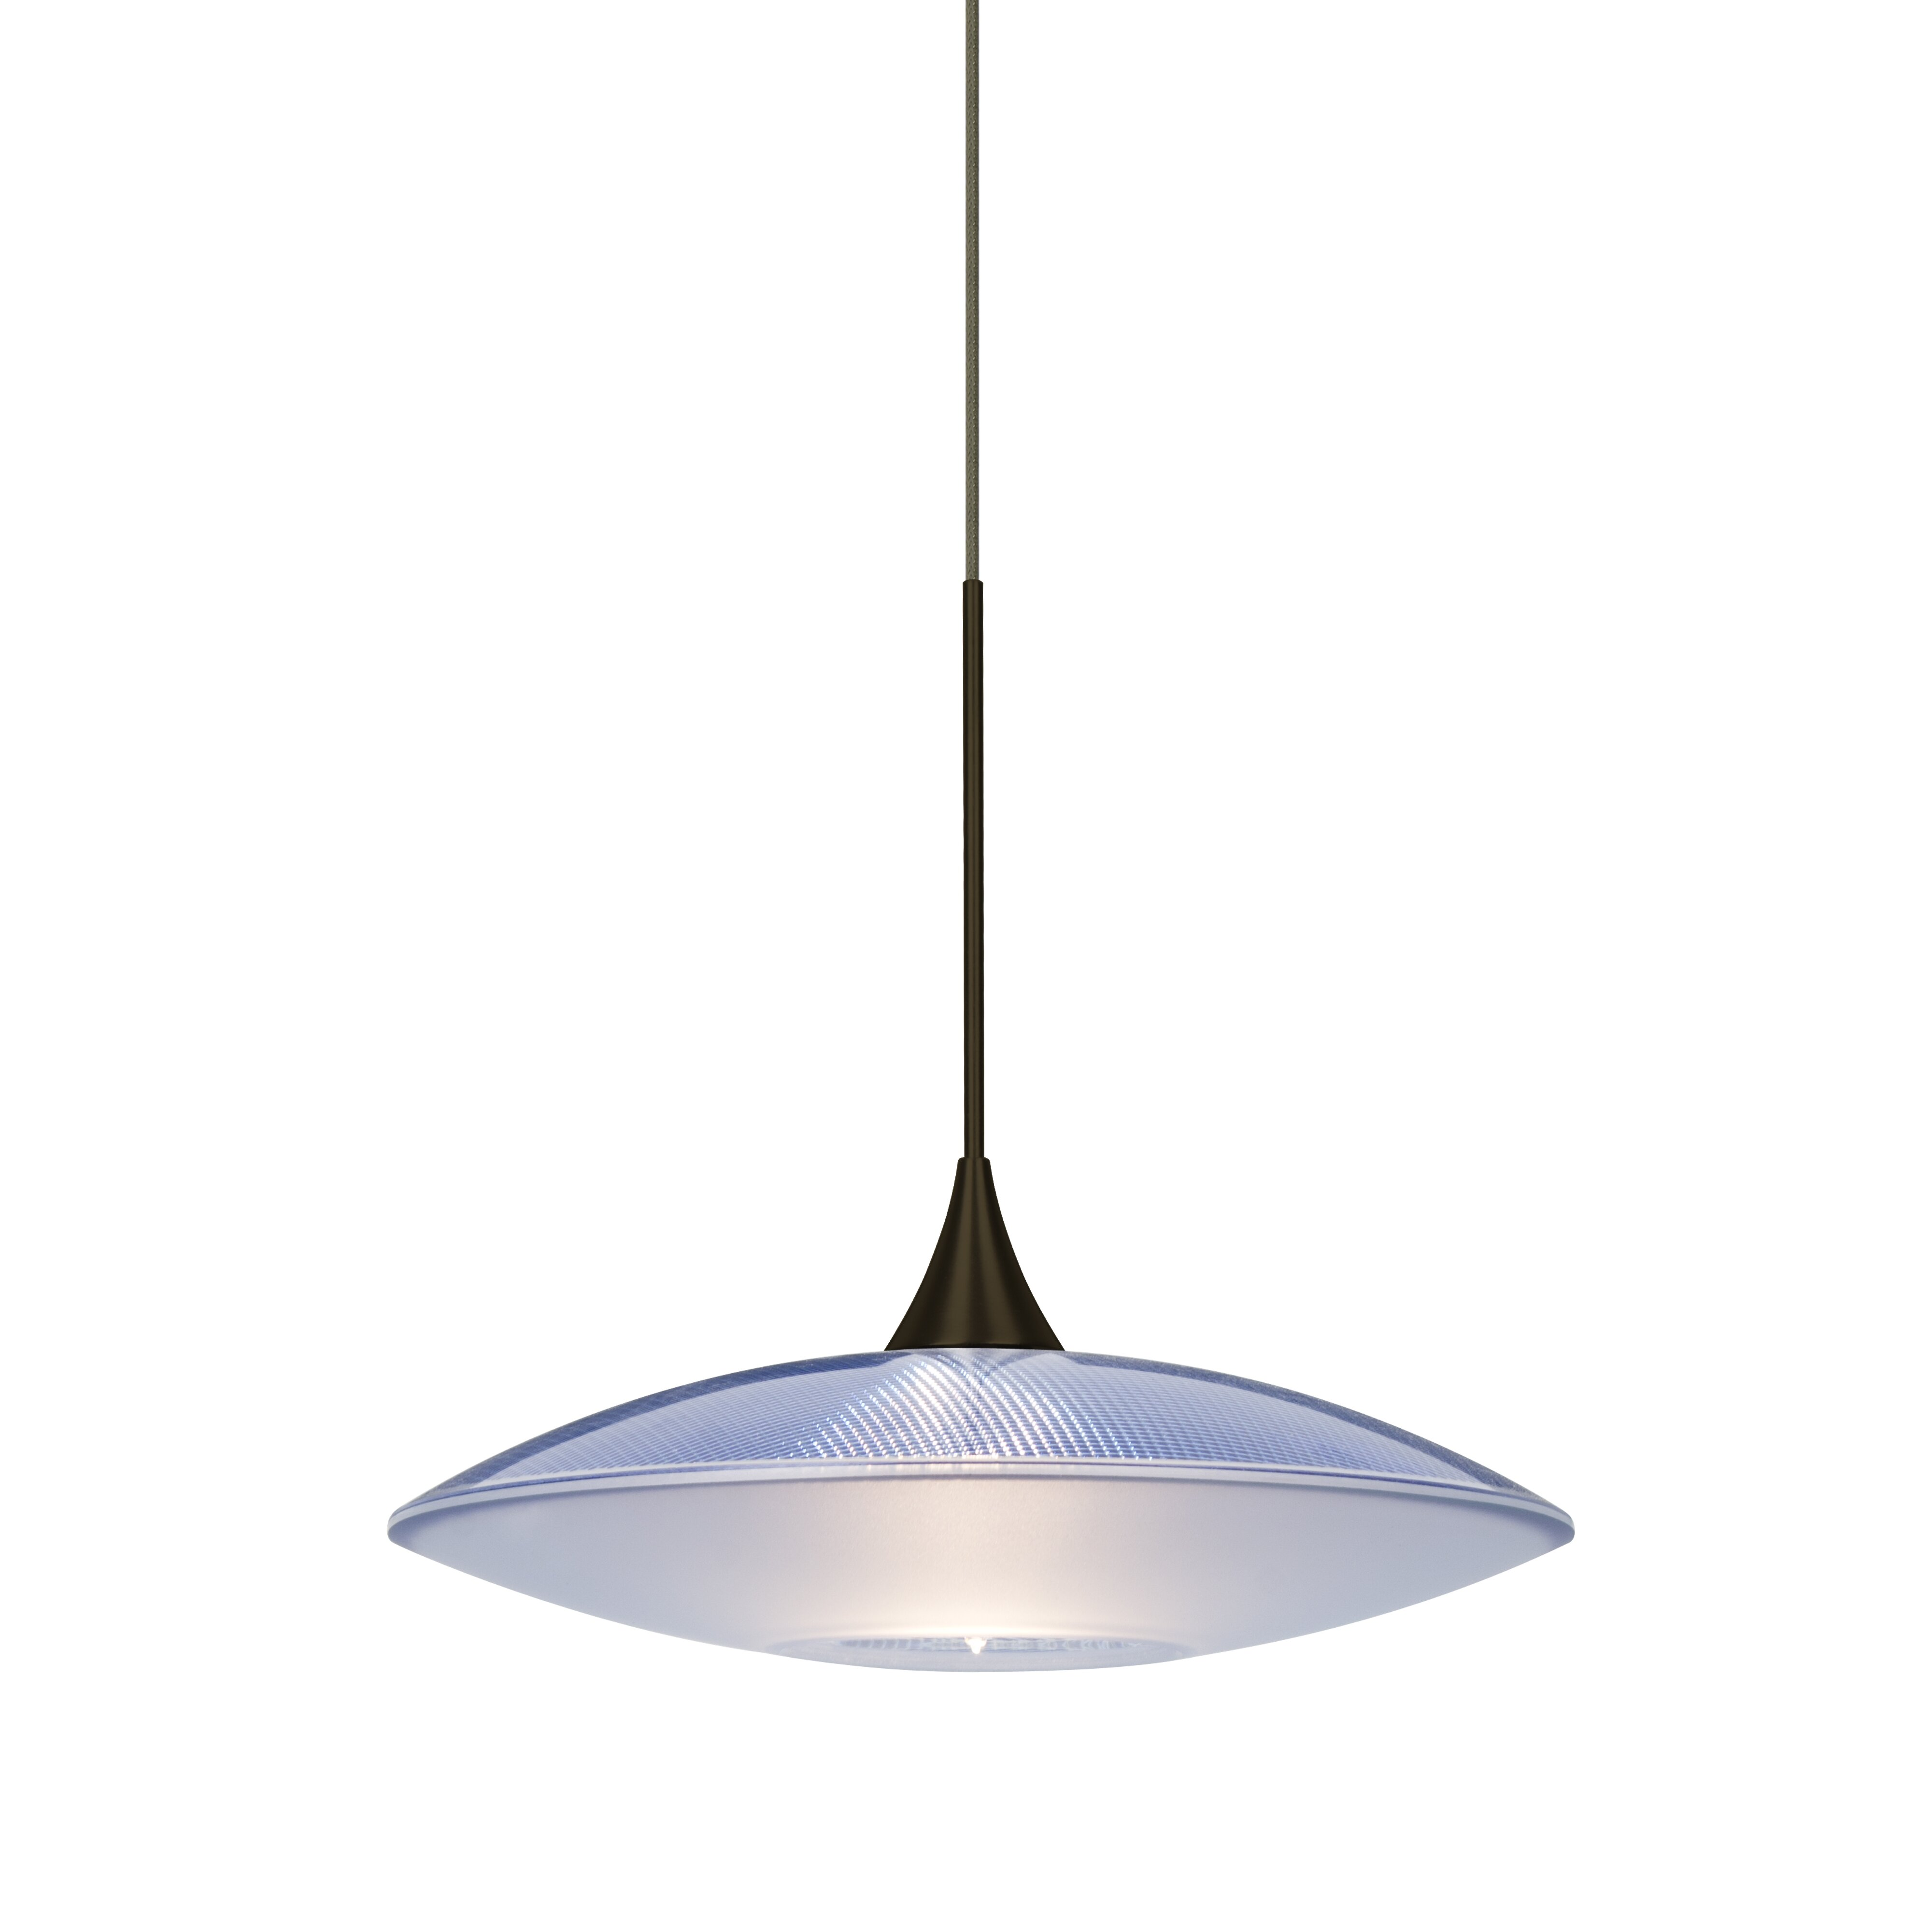 Besa Lighting Spazio 1 Light Cord Pendant